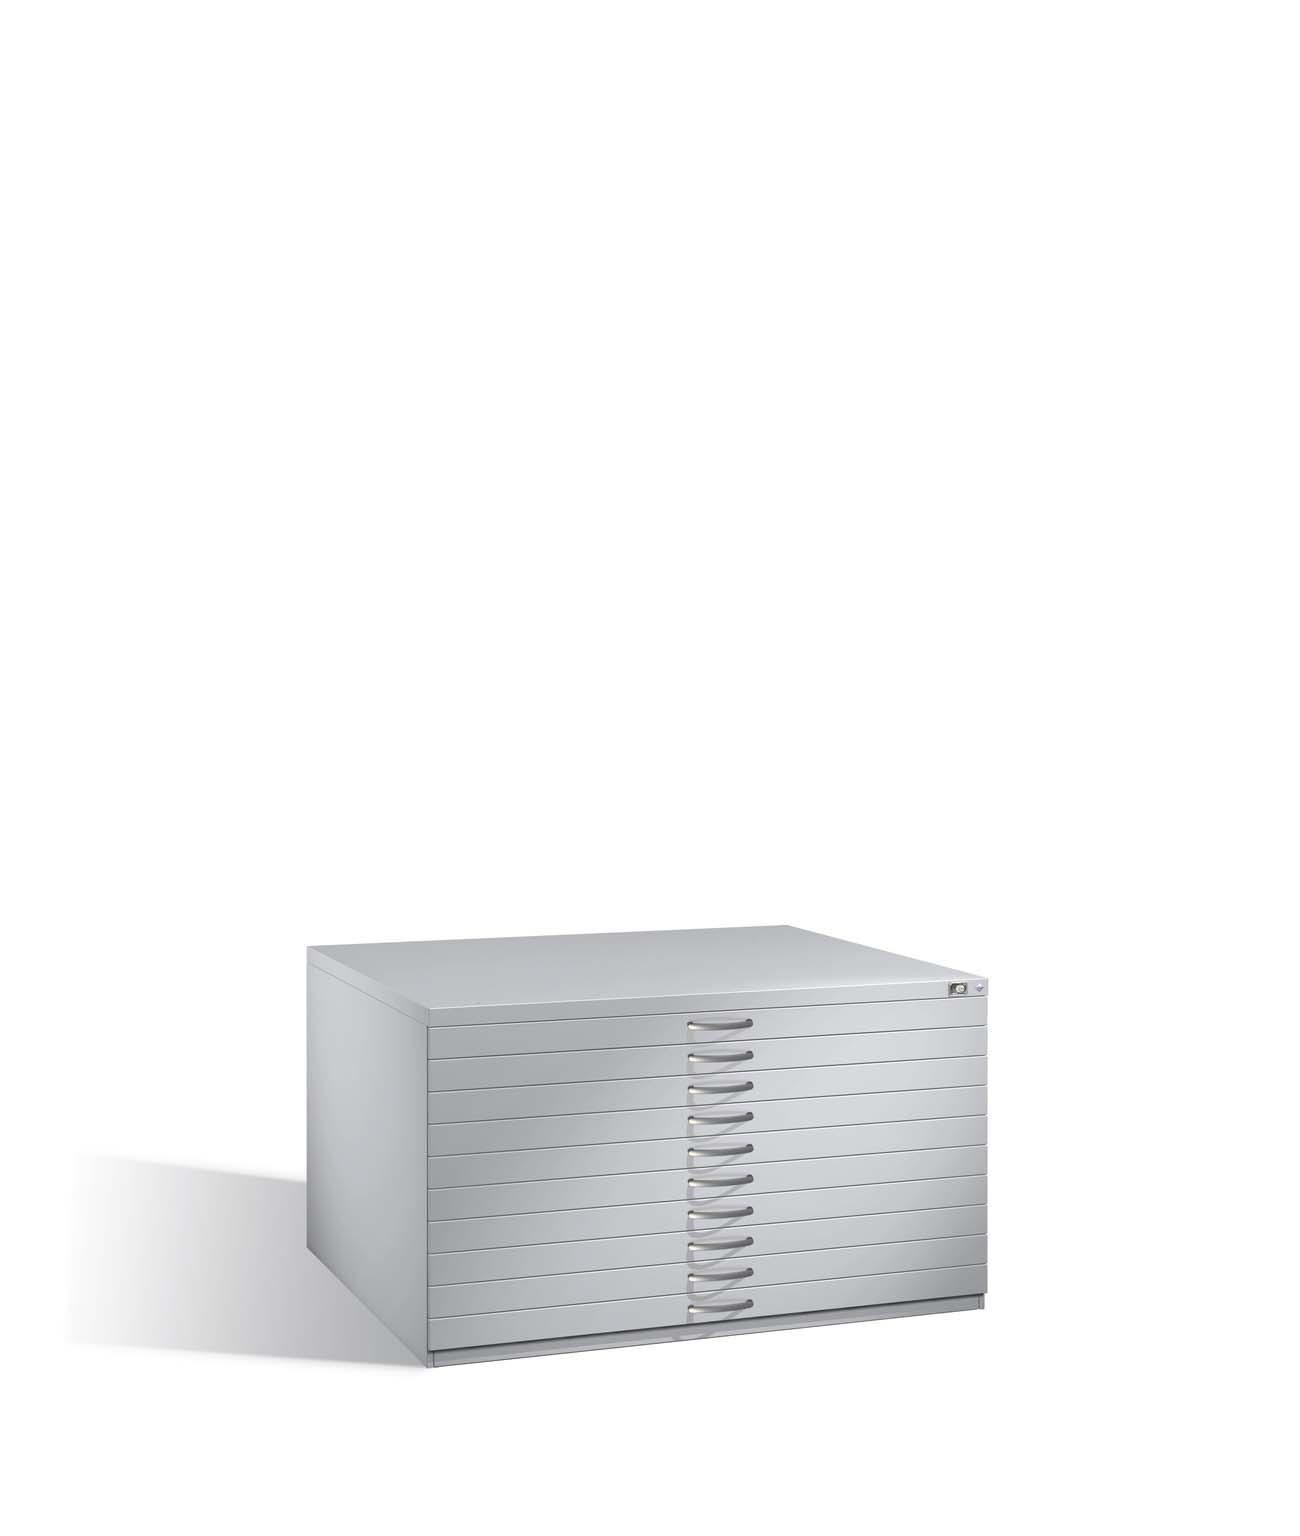 Flachablageschrank Serie 7100_7200, H760xB1350xT960mm